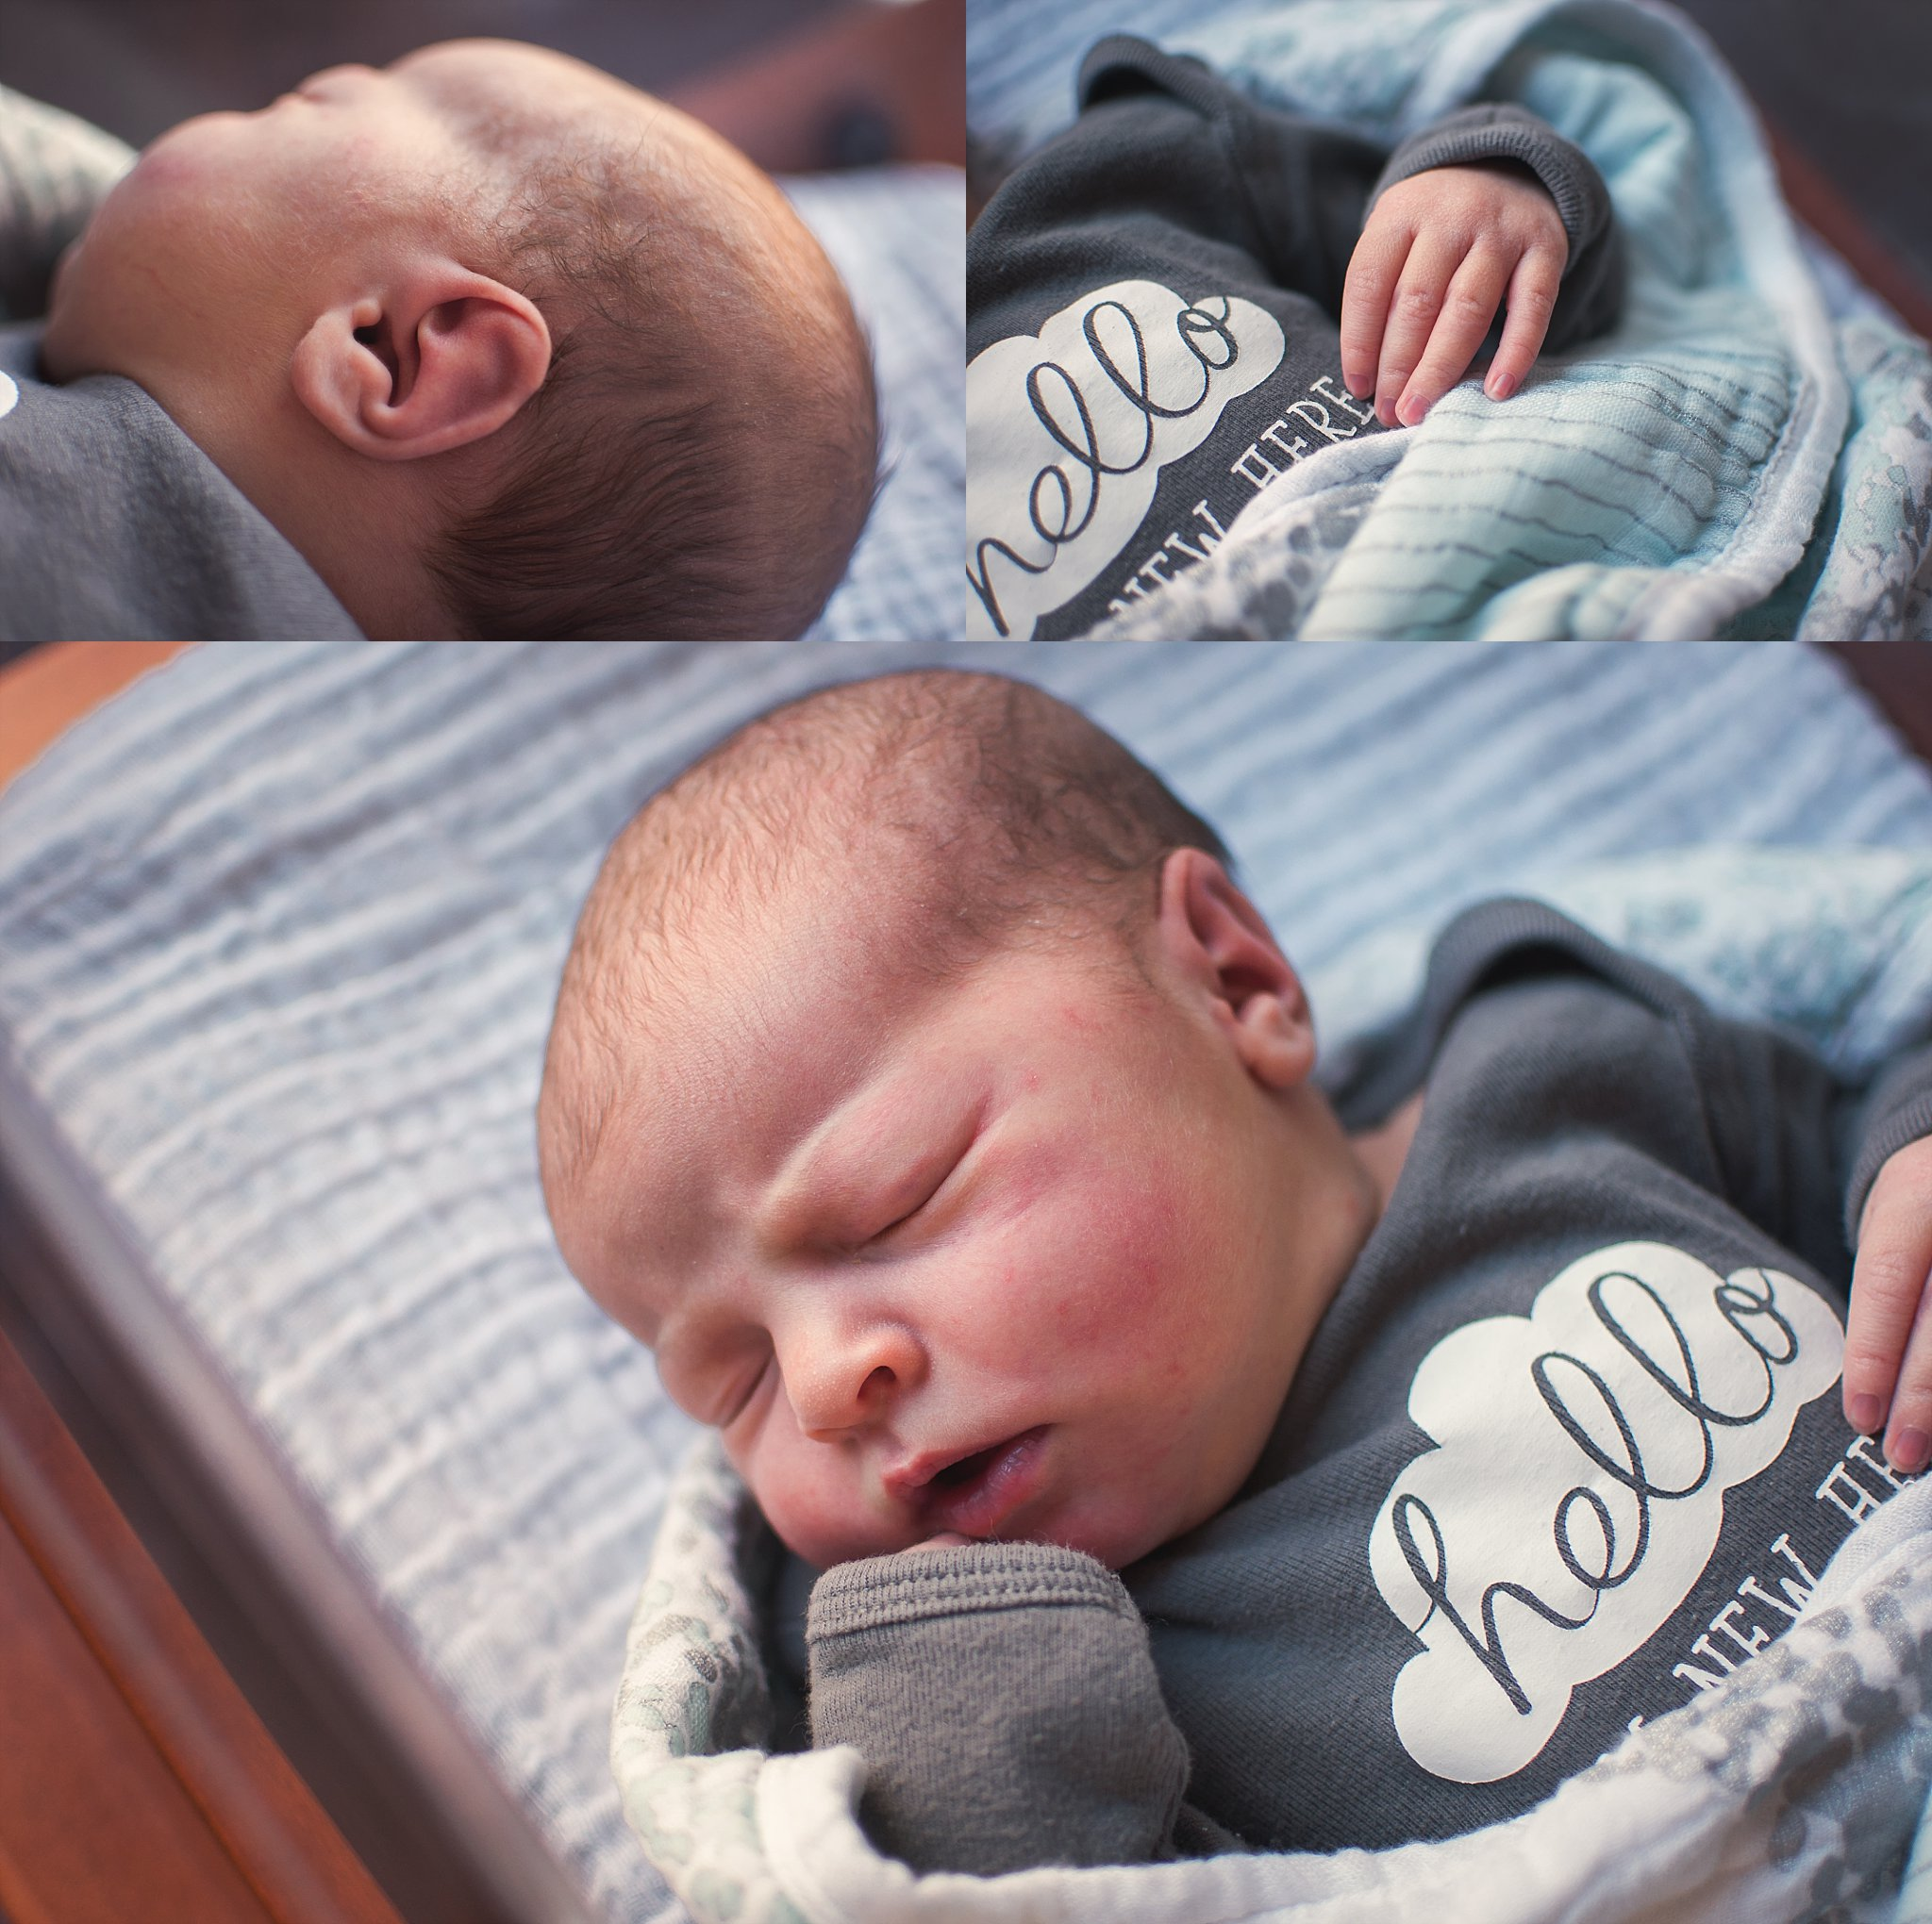 Newborn baby girl sleeps in bassinett at OSF St Francis Peoria.